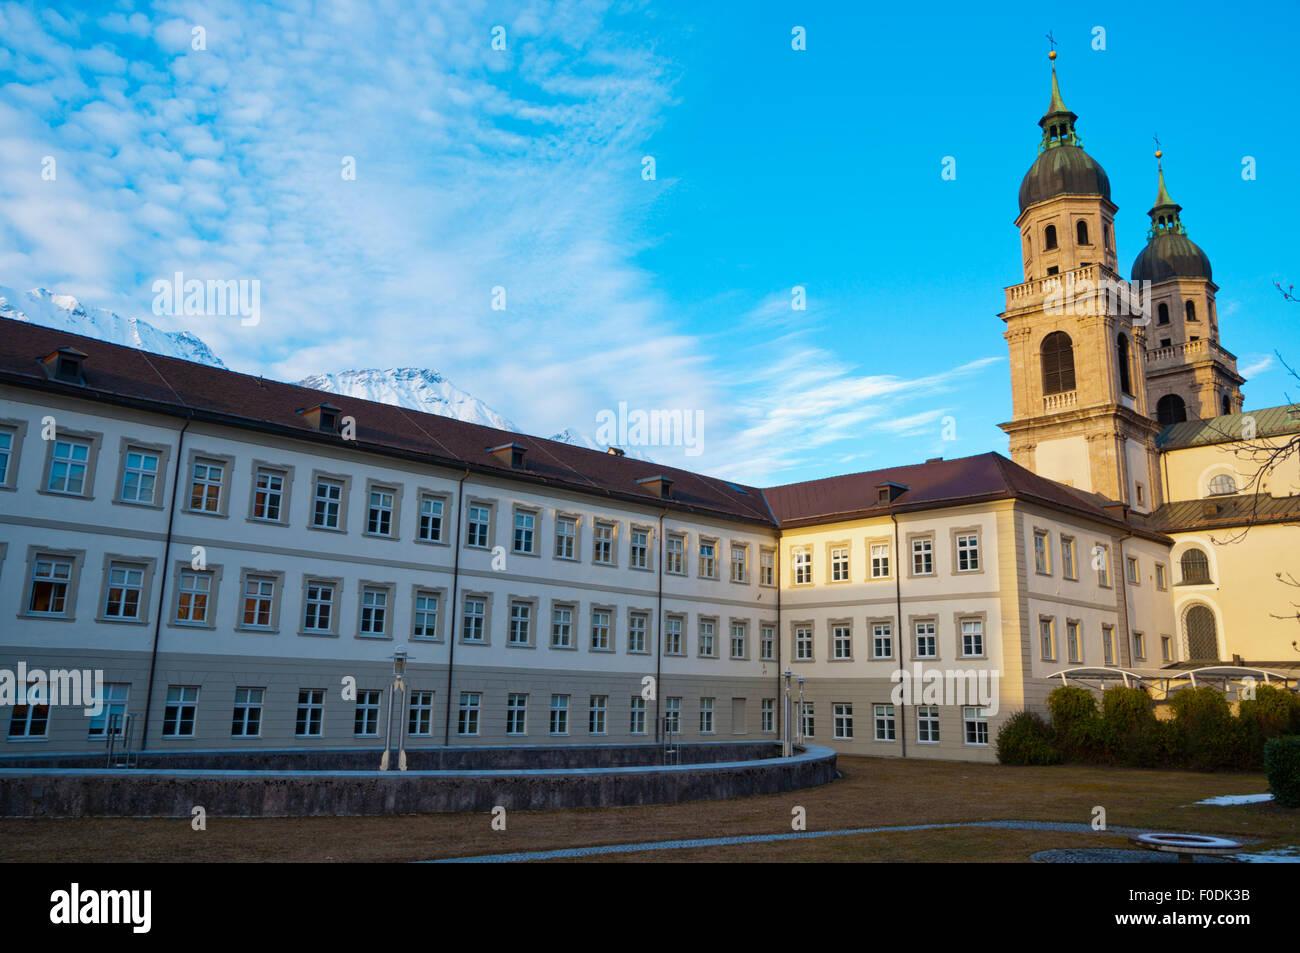 Jesuitenkirche, Jesuit church, and University Theological department buildigns, Altstadt, old town, Innsbruck, Austria - Stock Image